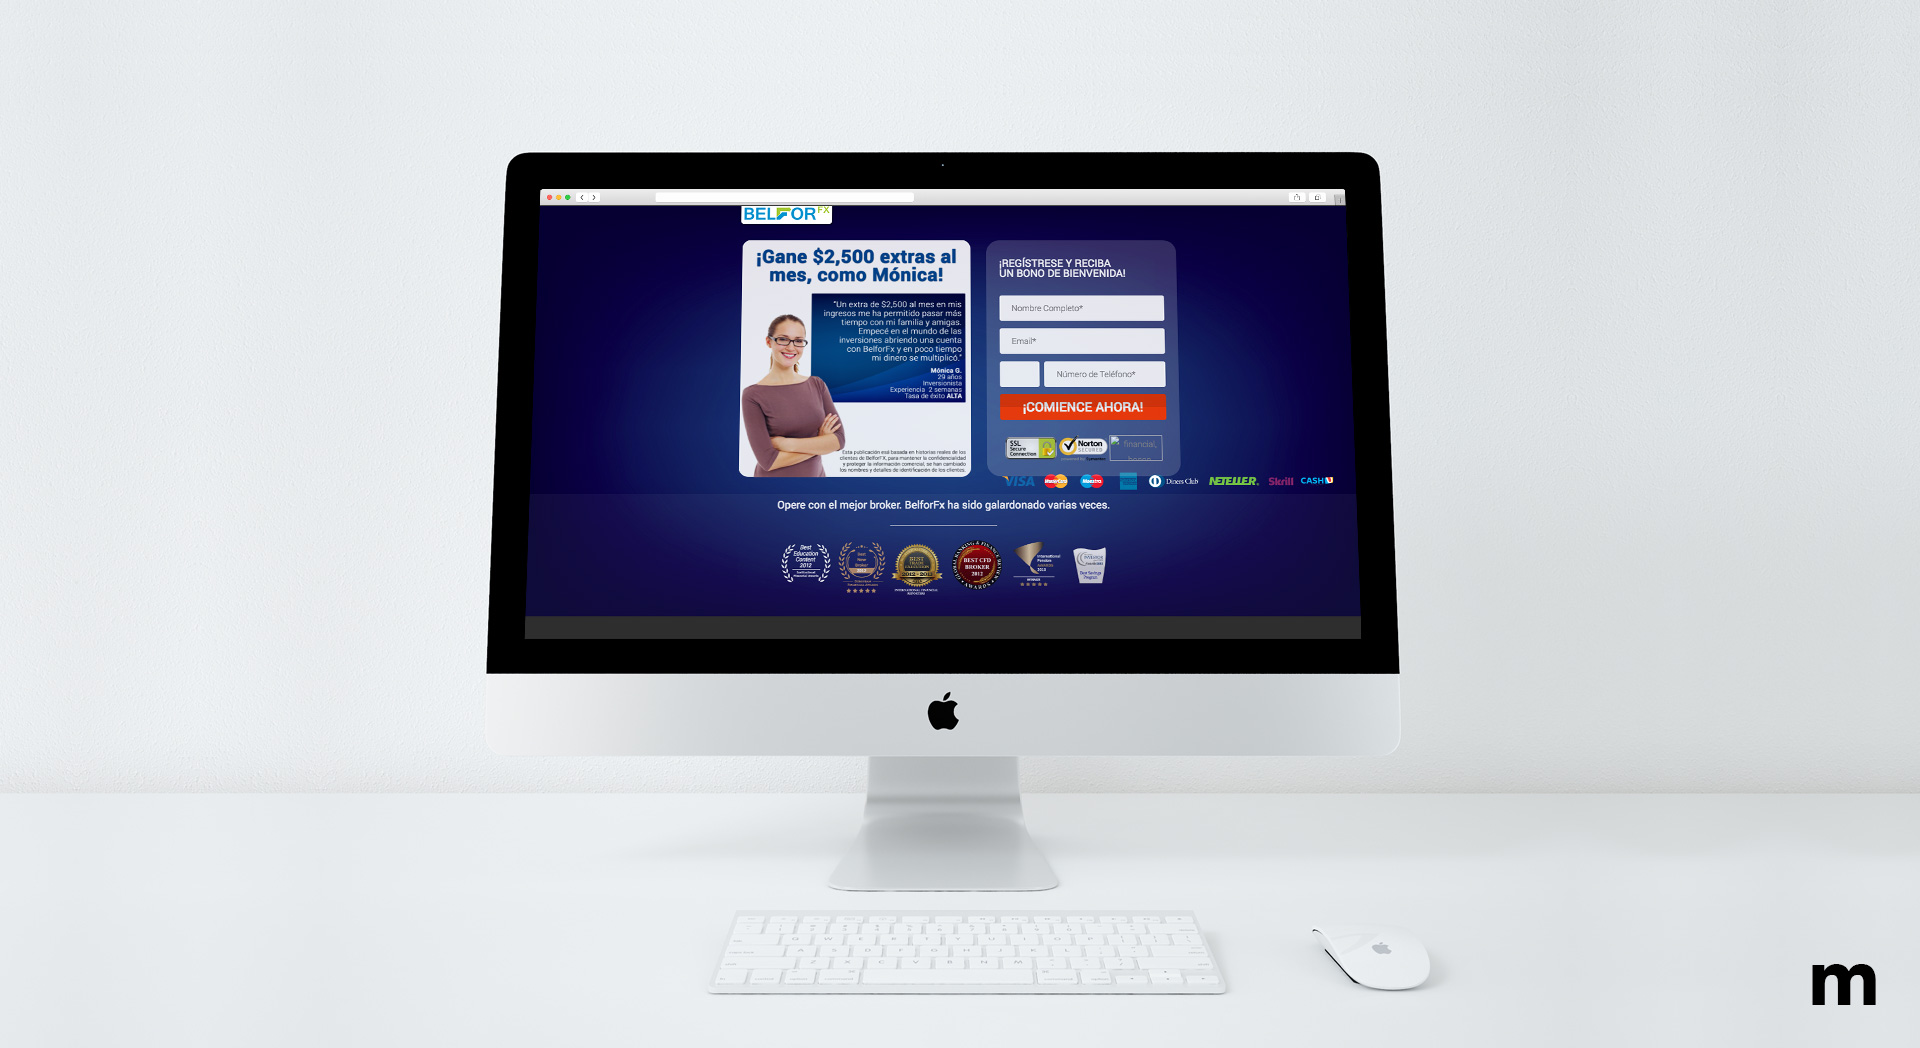 mora-de-la-taya-website-web-landing-page-finance-image-computer-6